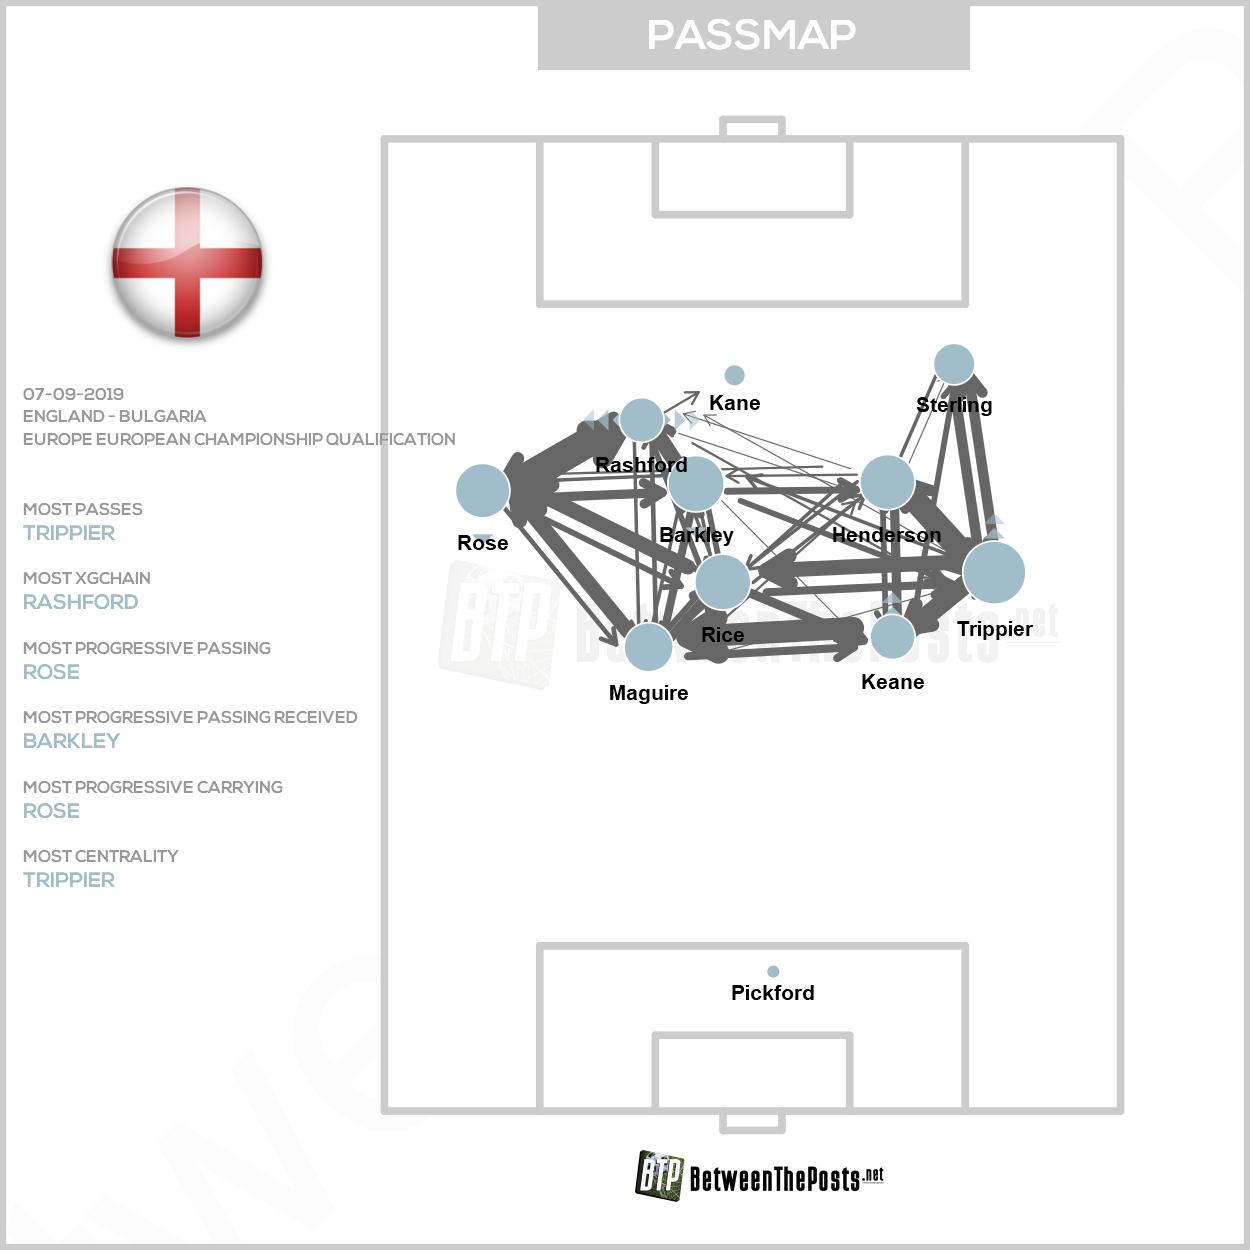 Passmap England Bulgaria 4-0 European Qualifiers